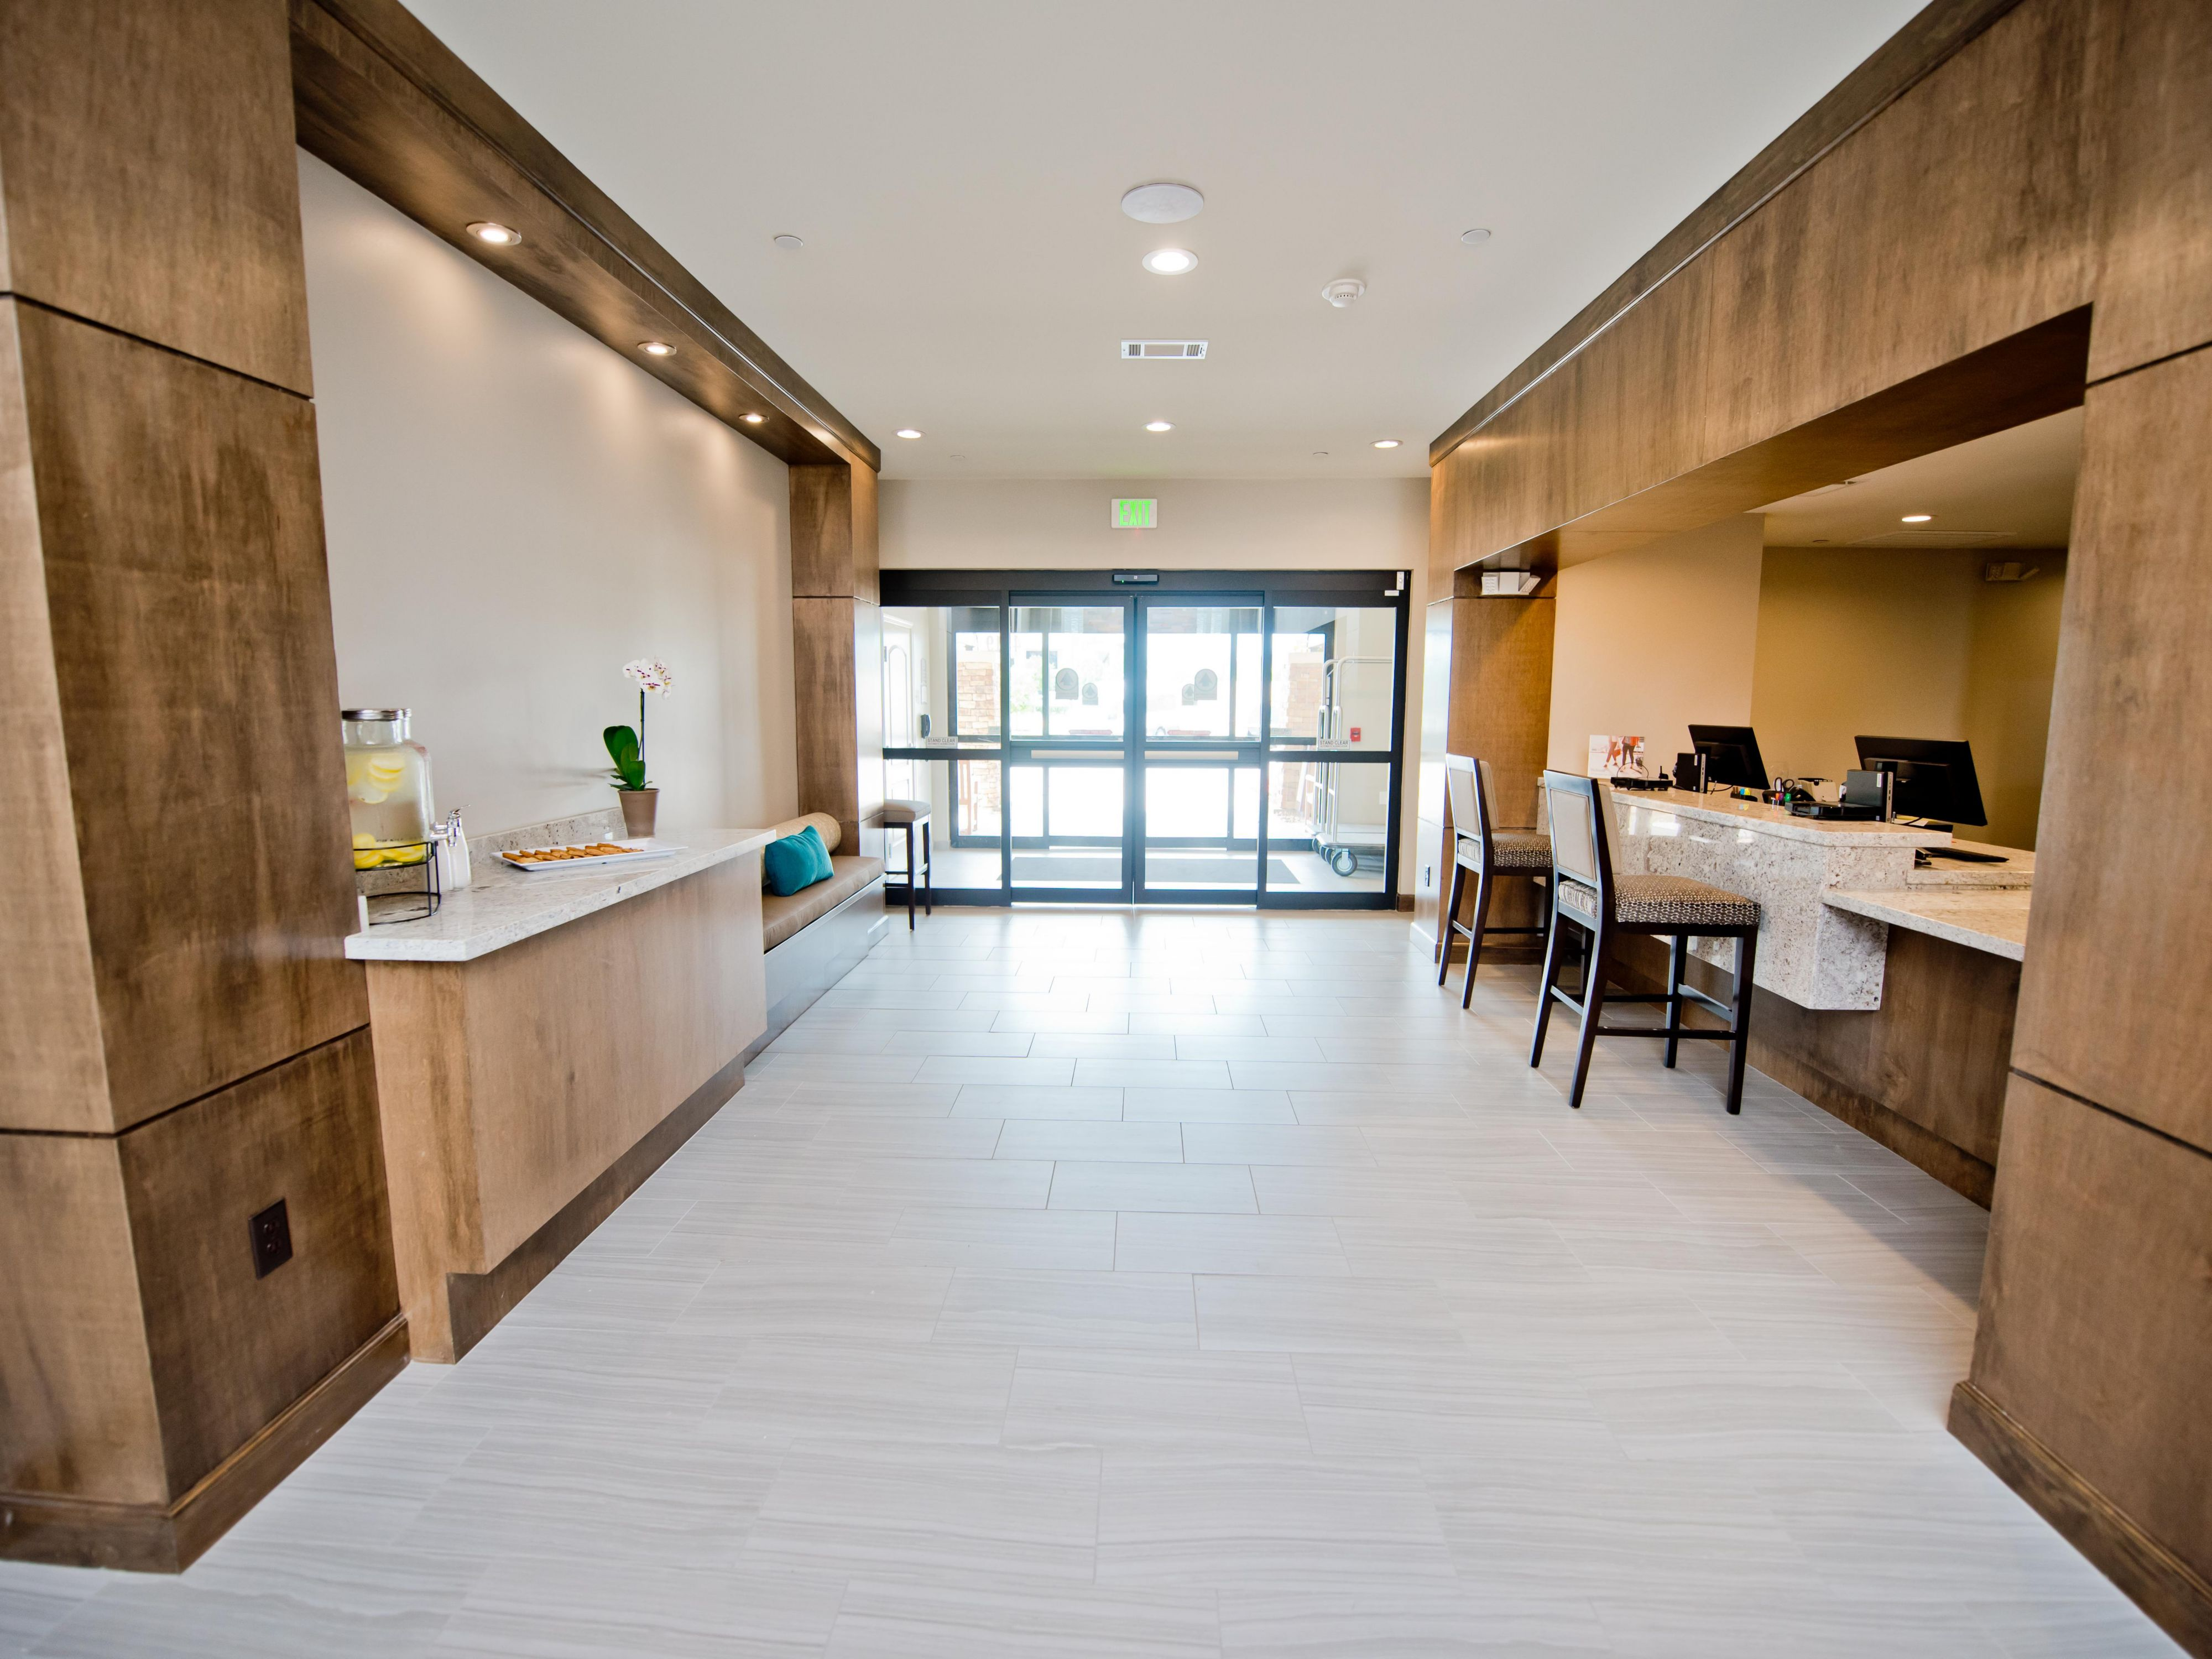 Hotels Near Remington College in Houston, Texas